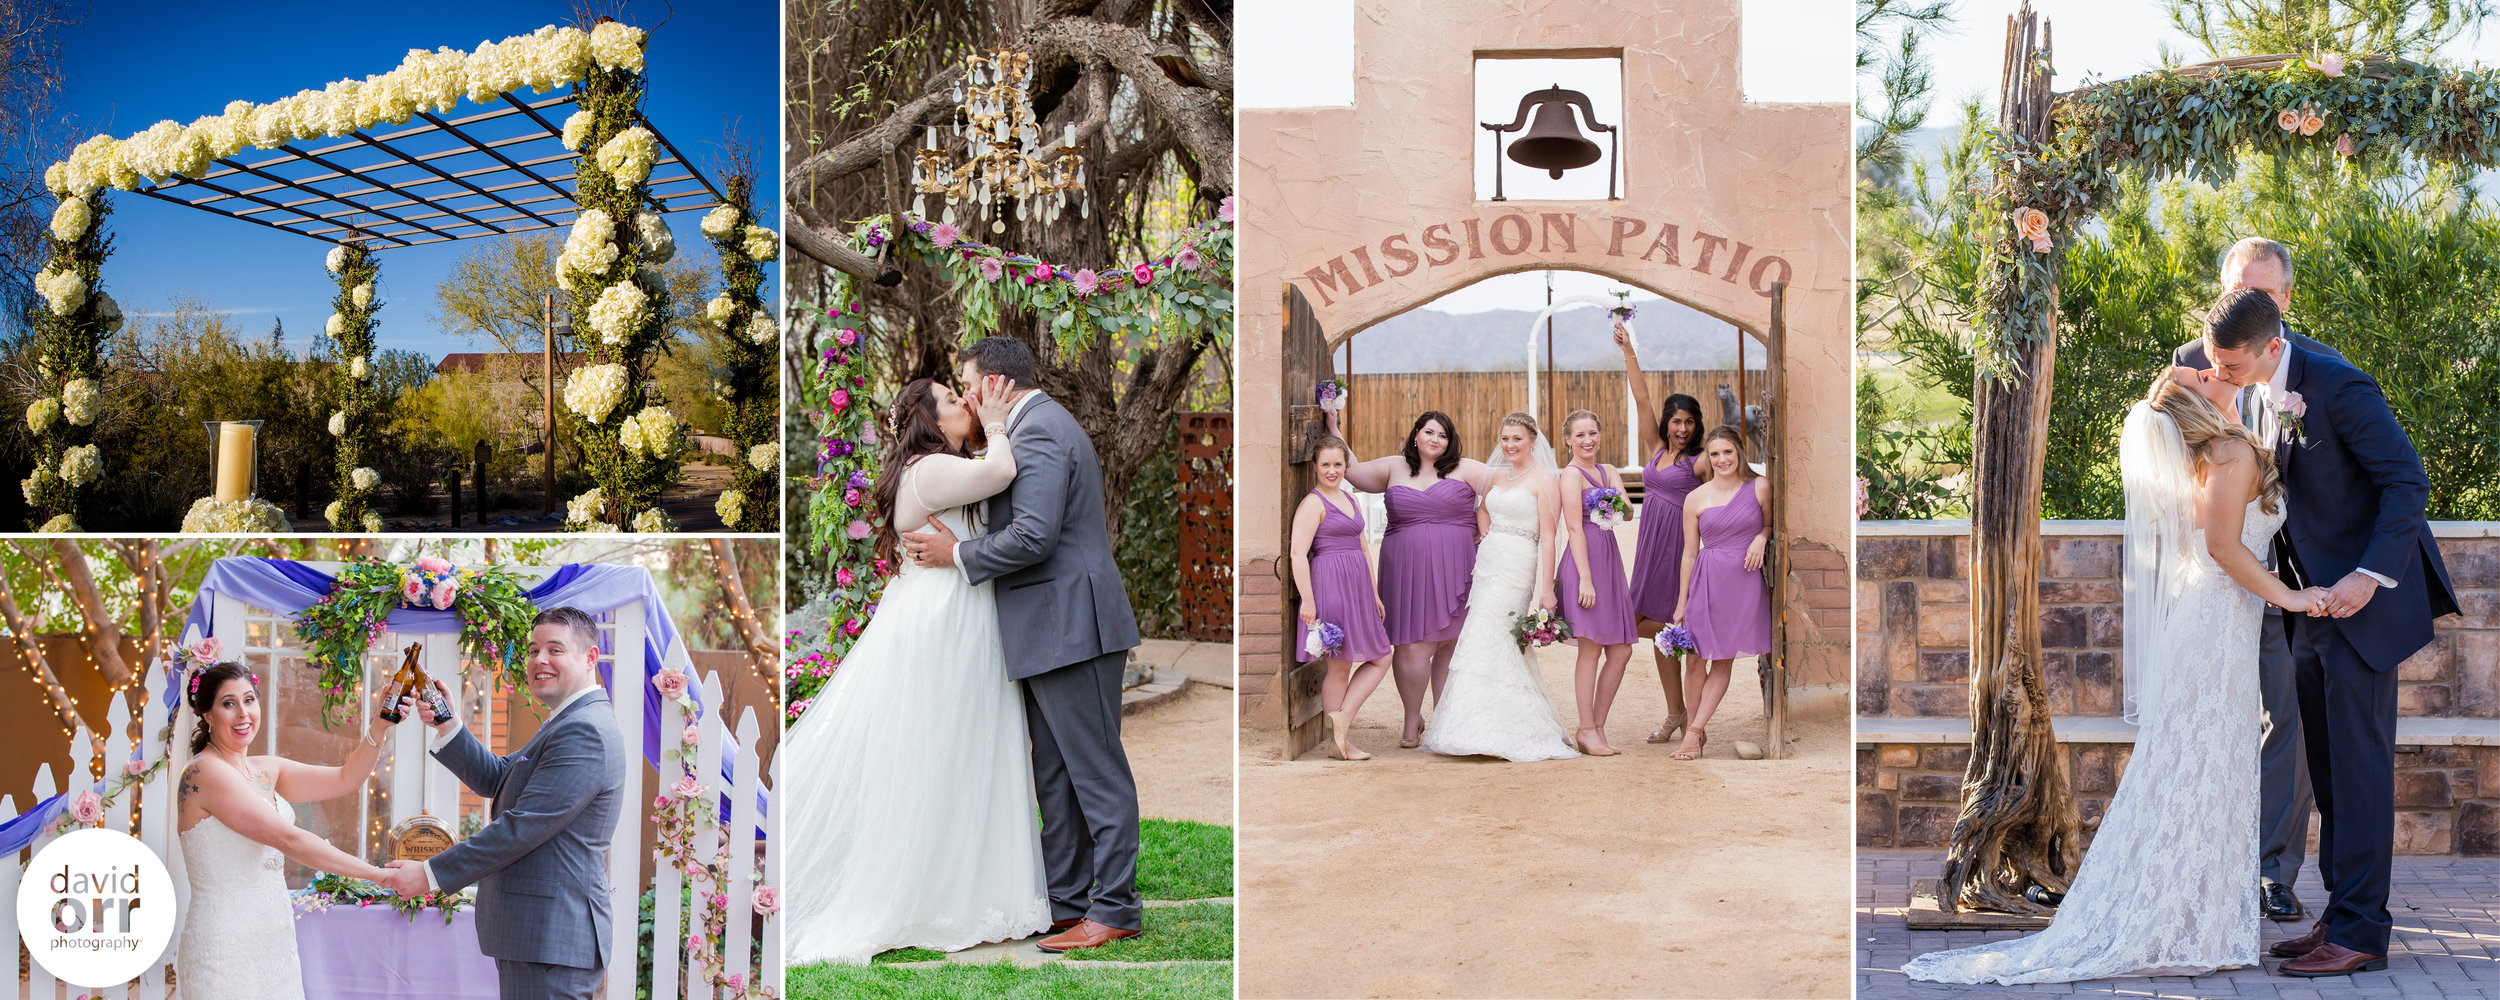 DavidOrrPhotography_Wedding-Arches-Bowers.jpg